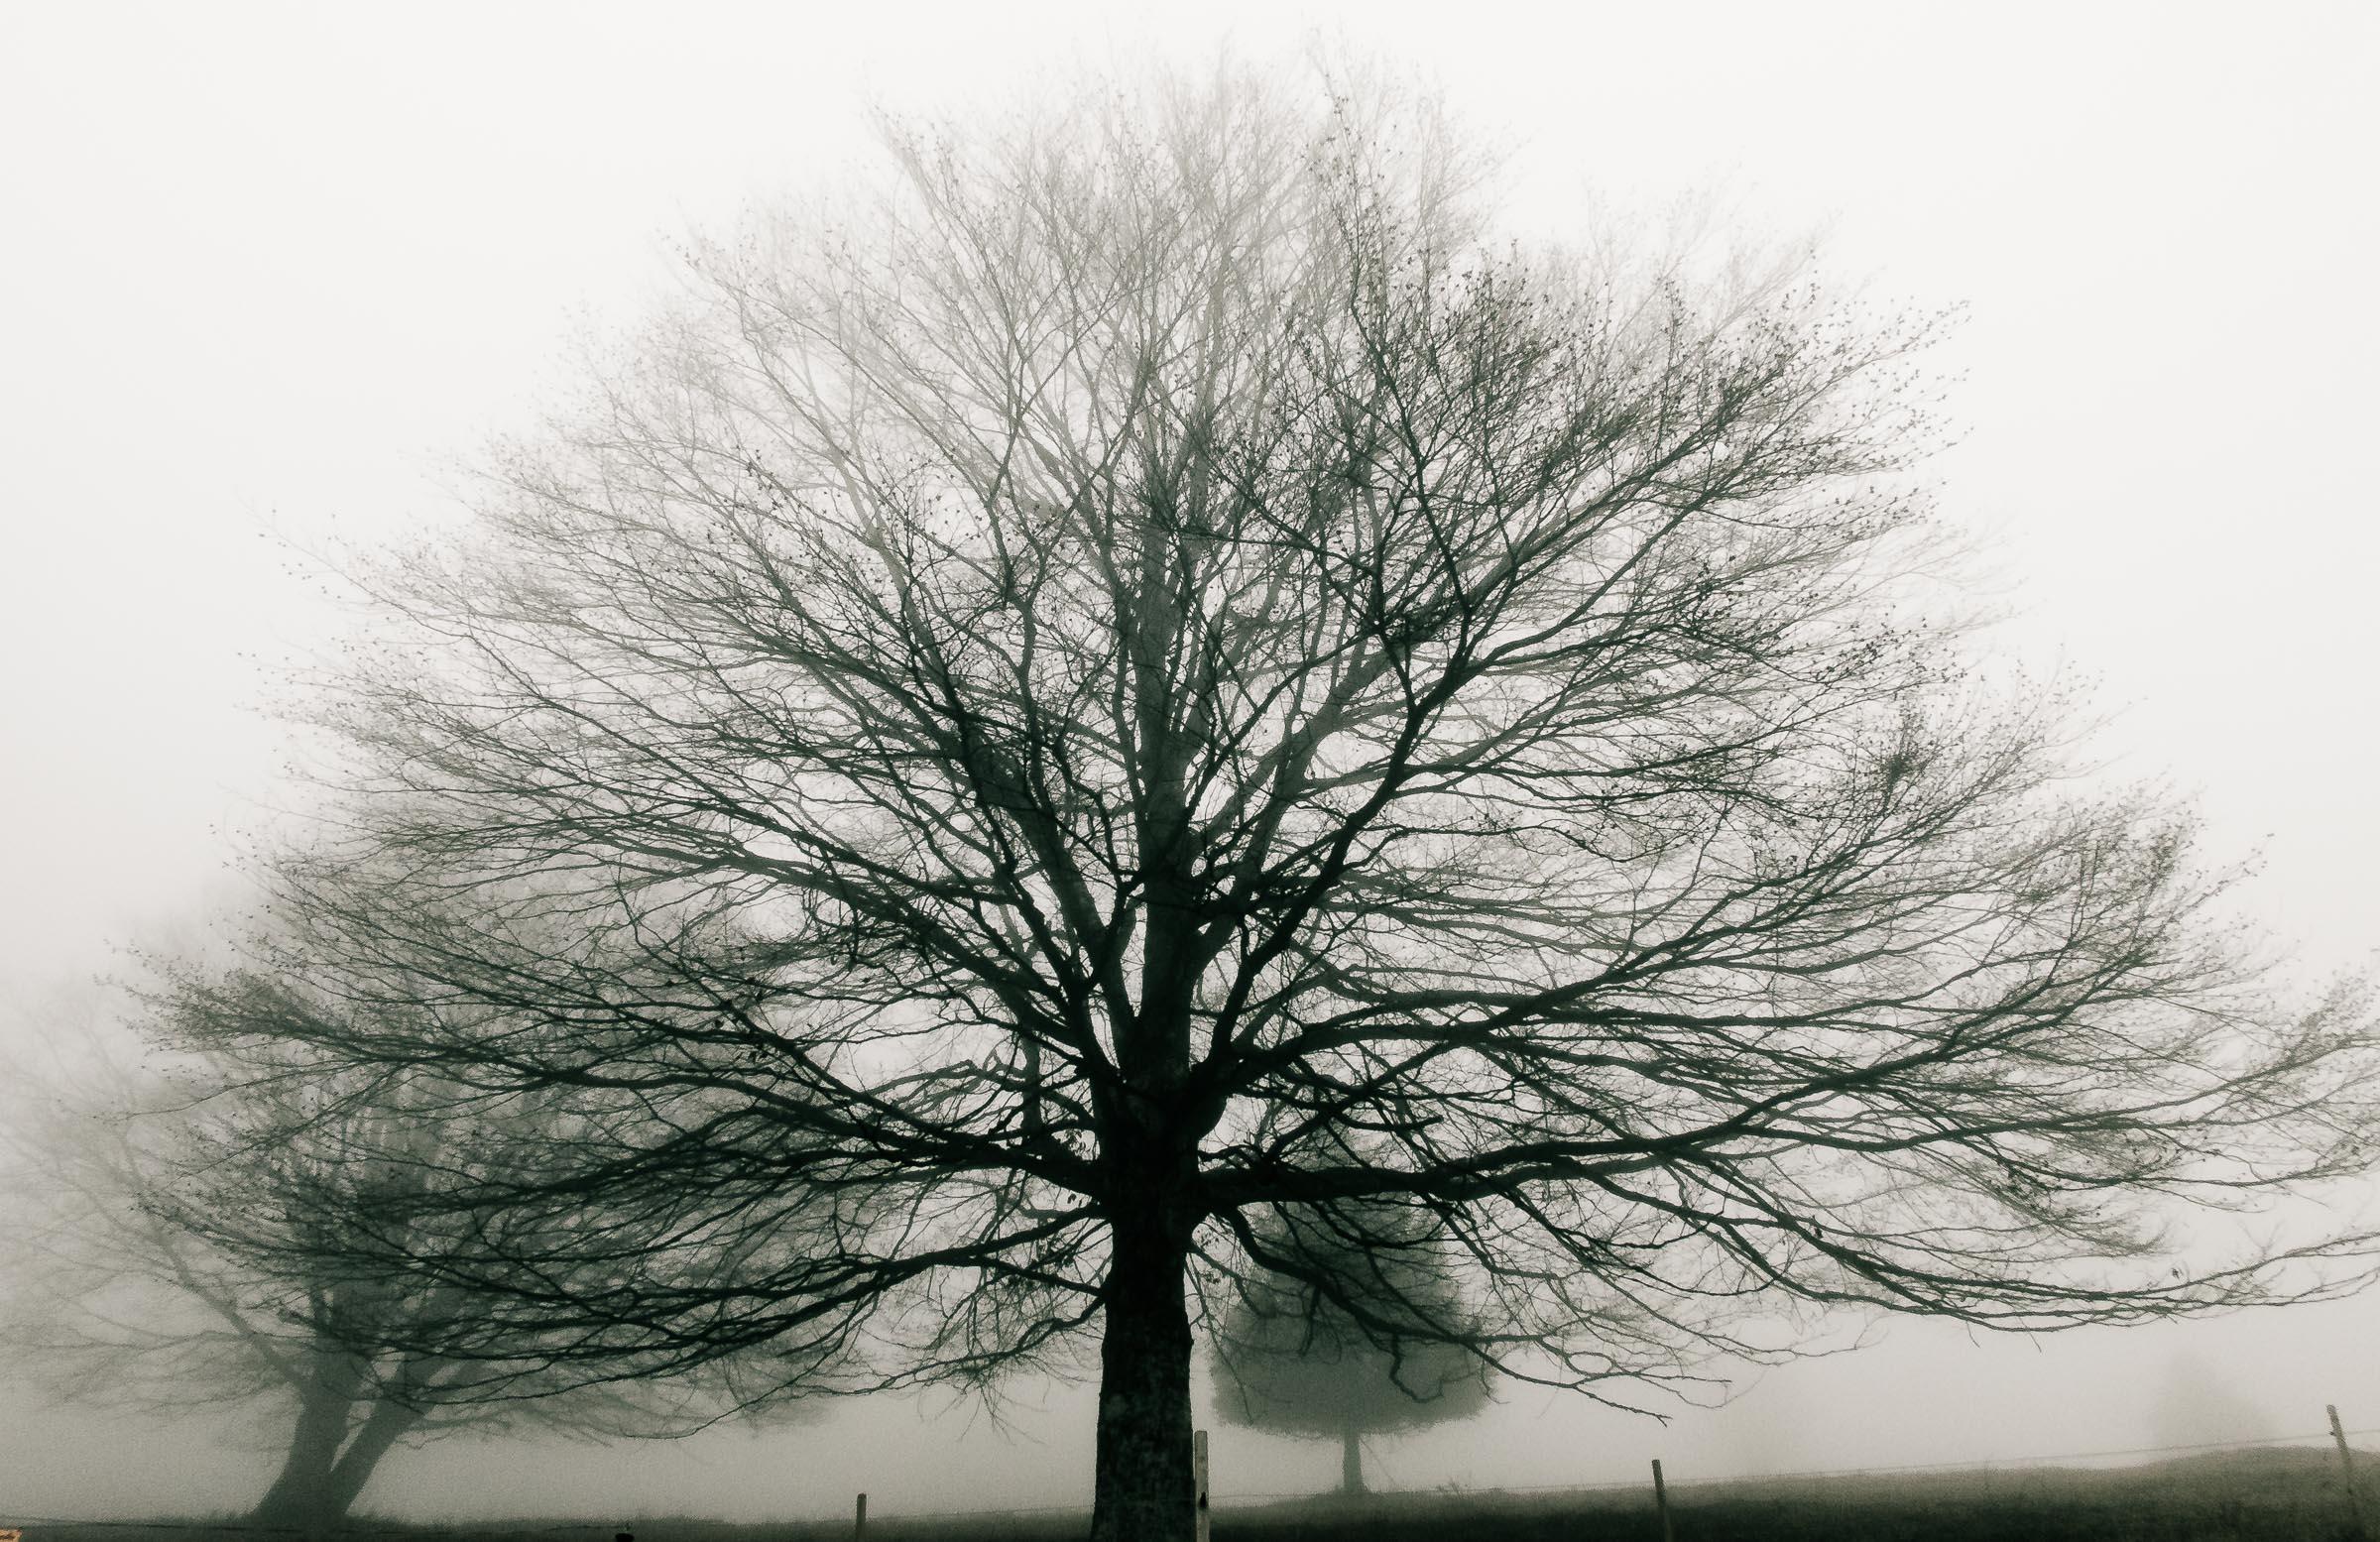 181216_Nebel_Wald_031